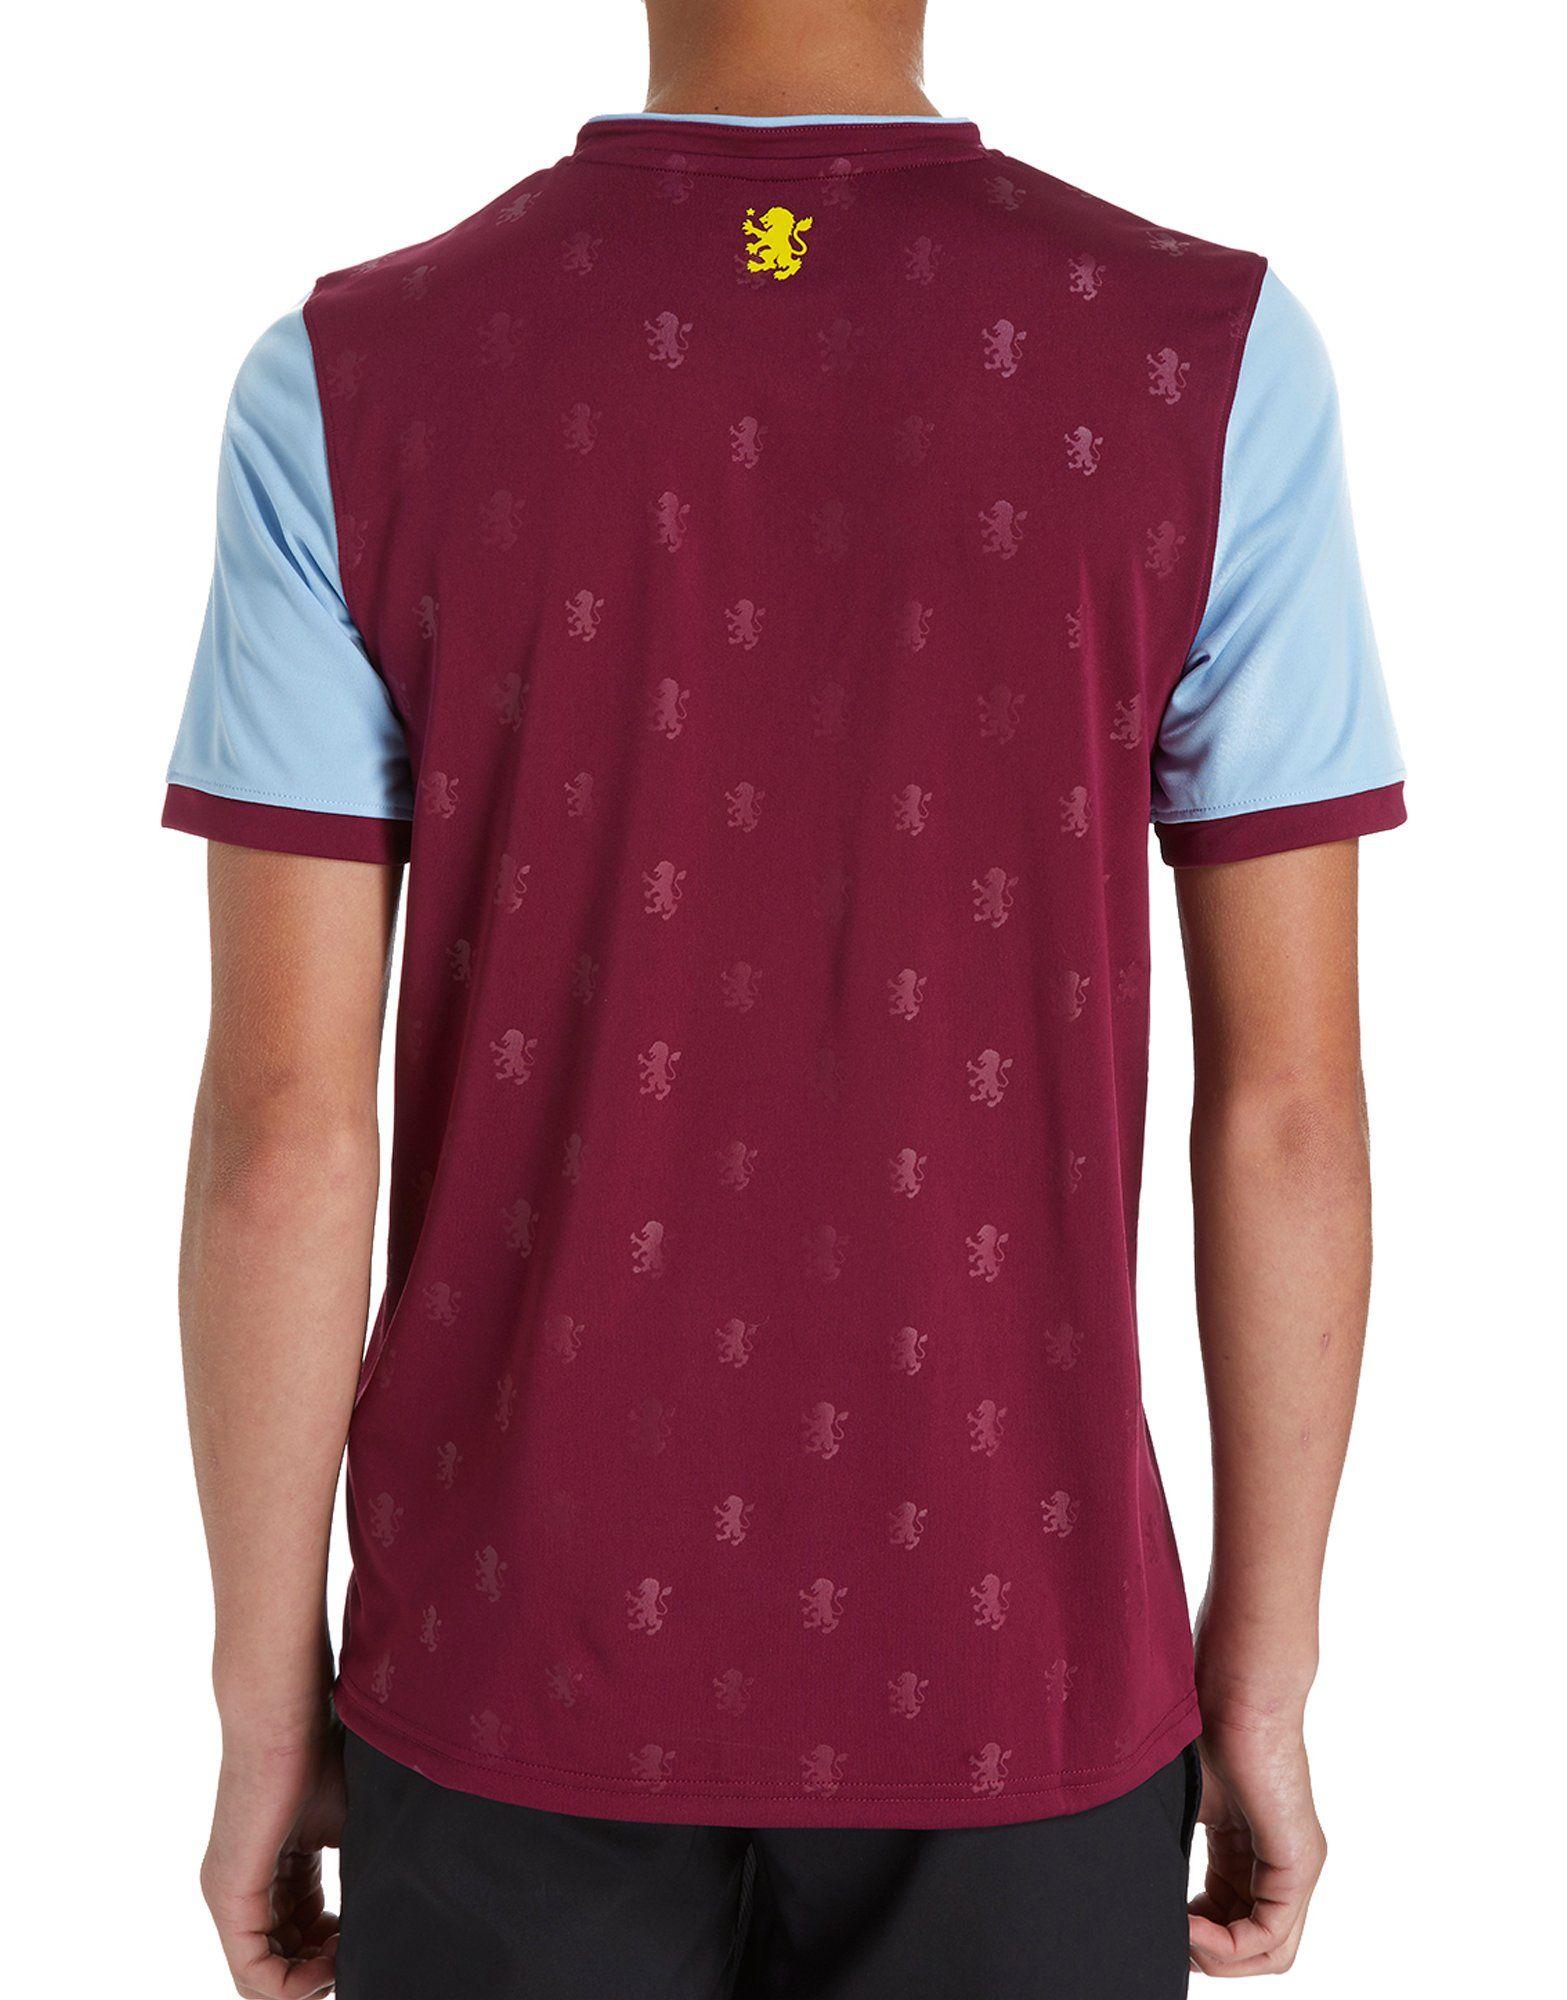 Under Armour Aston Villa Home Shirt 2017/18 Junior